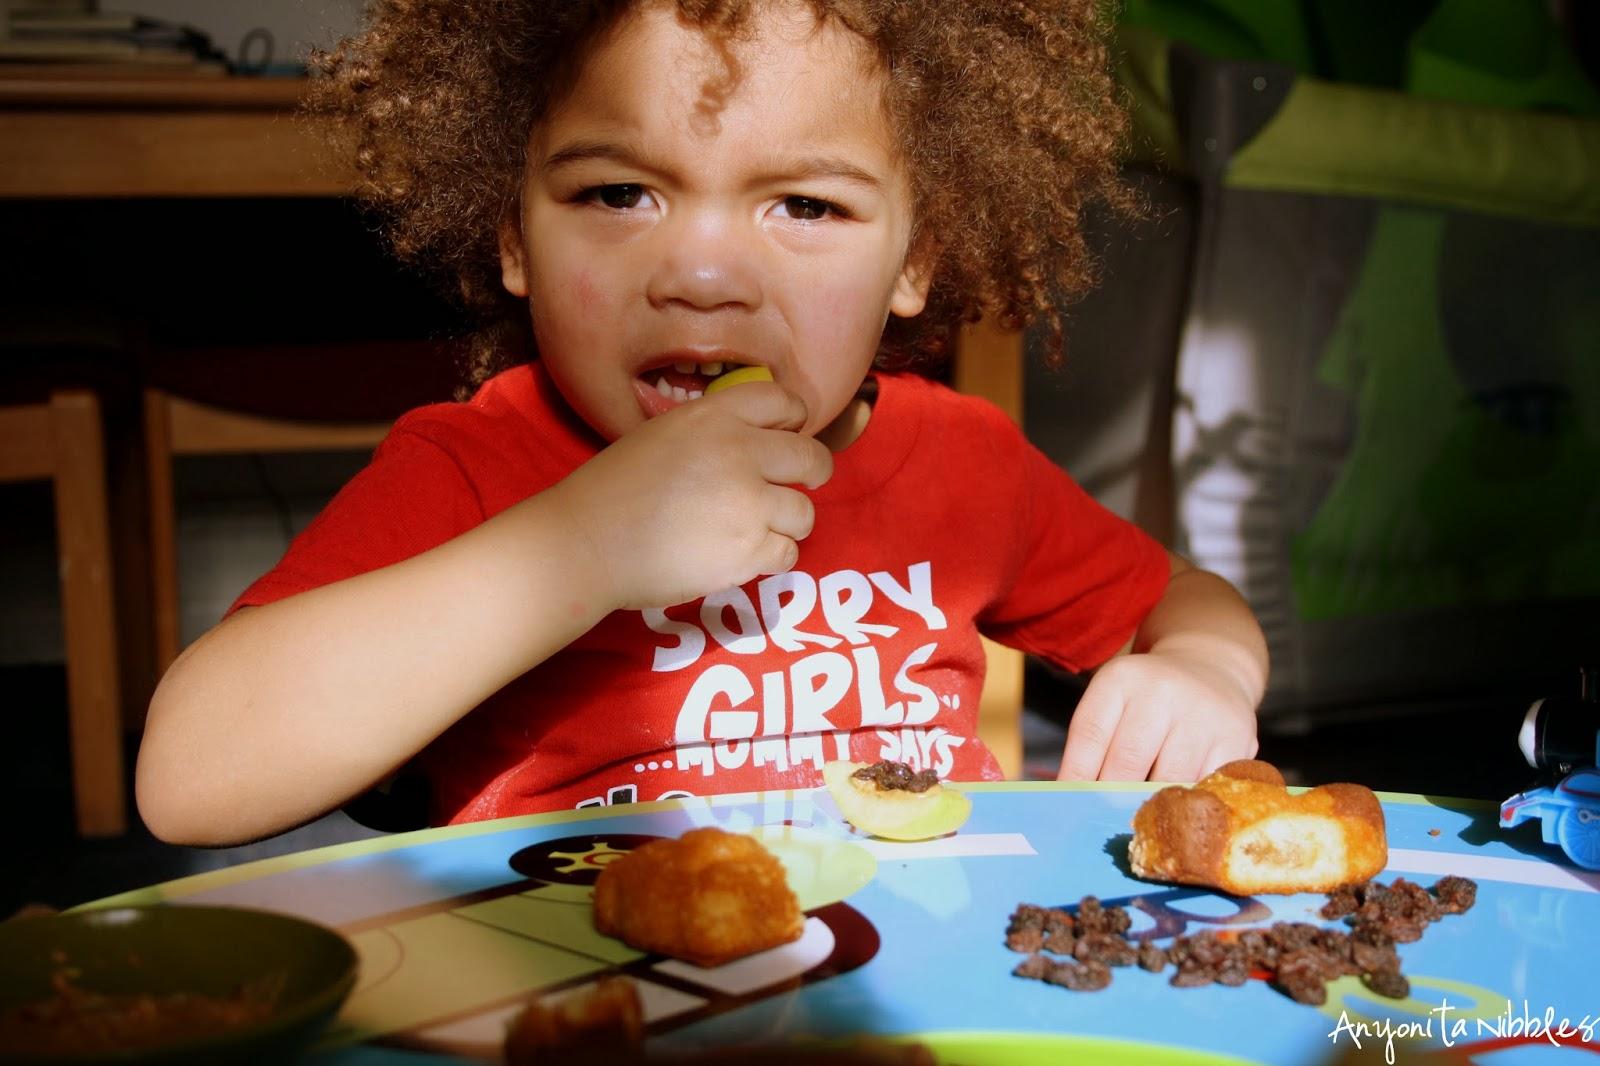 Snack time! #littleadventures